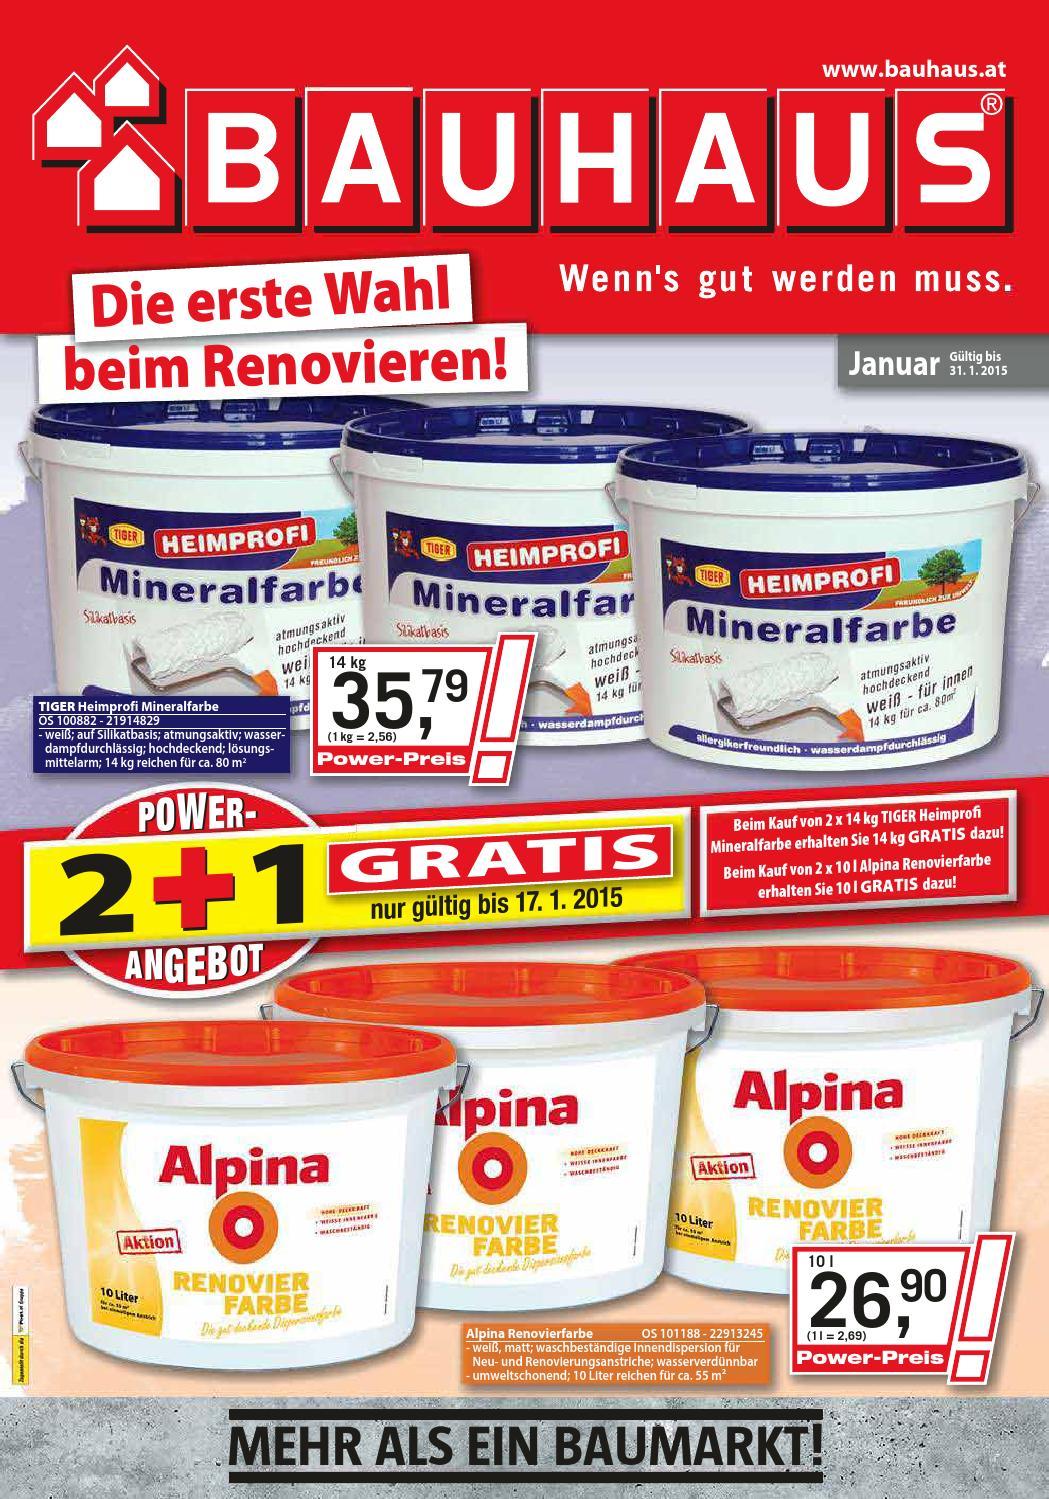 Bauhaus angebote 18 31januar2015 by issuu - Bauhaus regensburg angebote ...